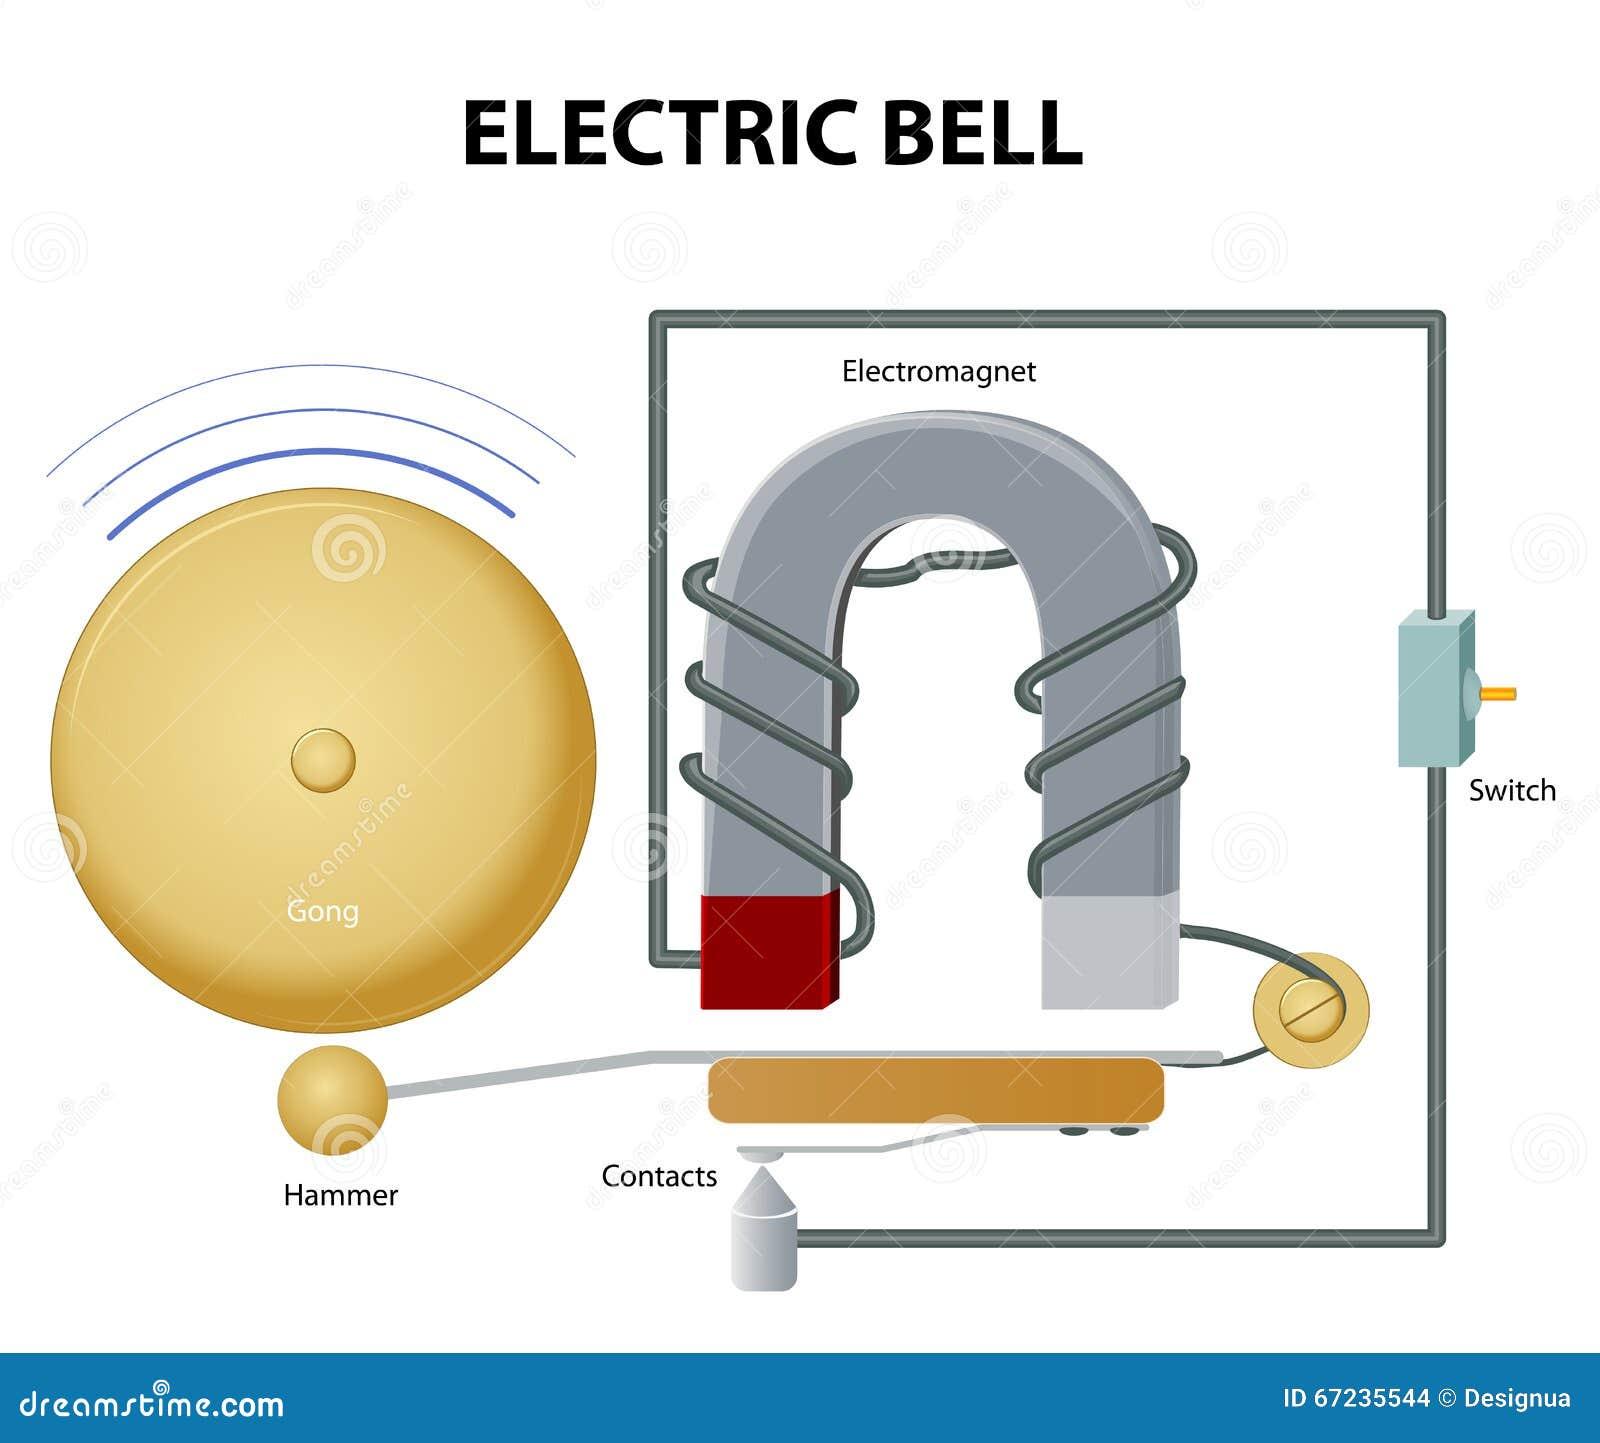 NTU1IHRpbWVyIGZvciBkaWdpdGFsIGNsb2Nr as well Four Tone Siren besides 3154464 68 Wiper Override further Visio Electronics in addition Watch. on alarm circuit schematic